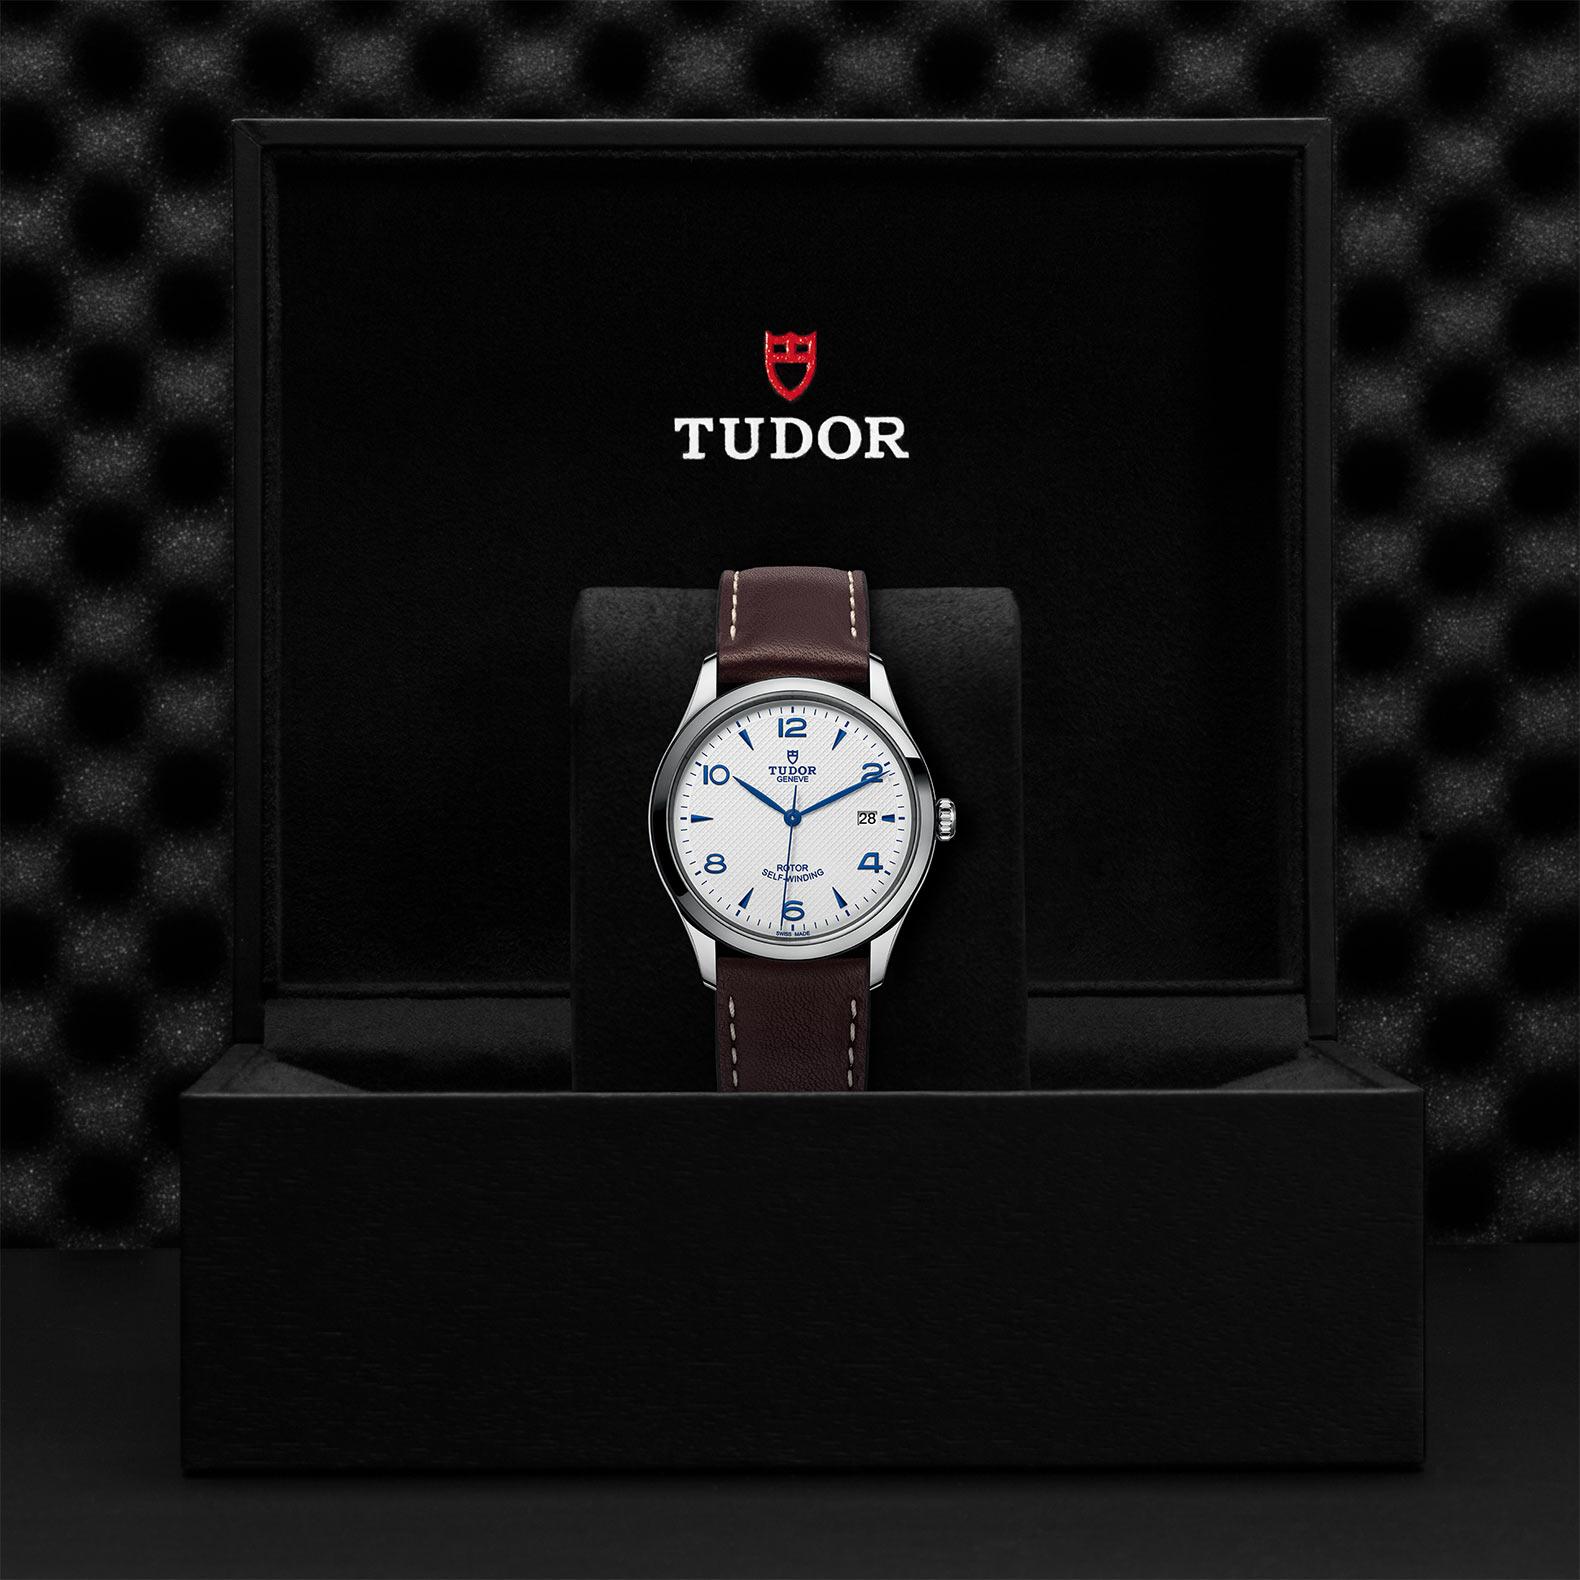 TUDOR 1926 - M91550-0010